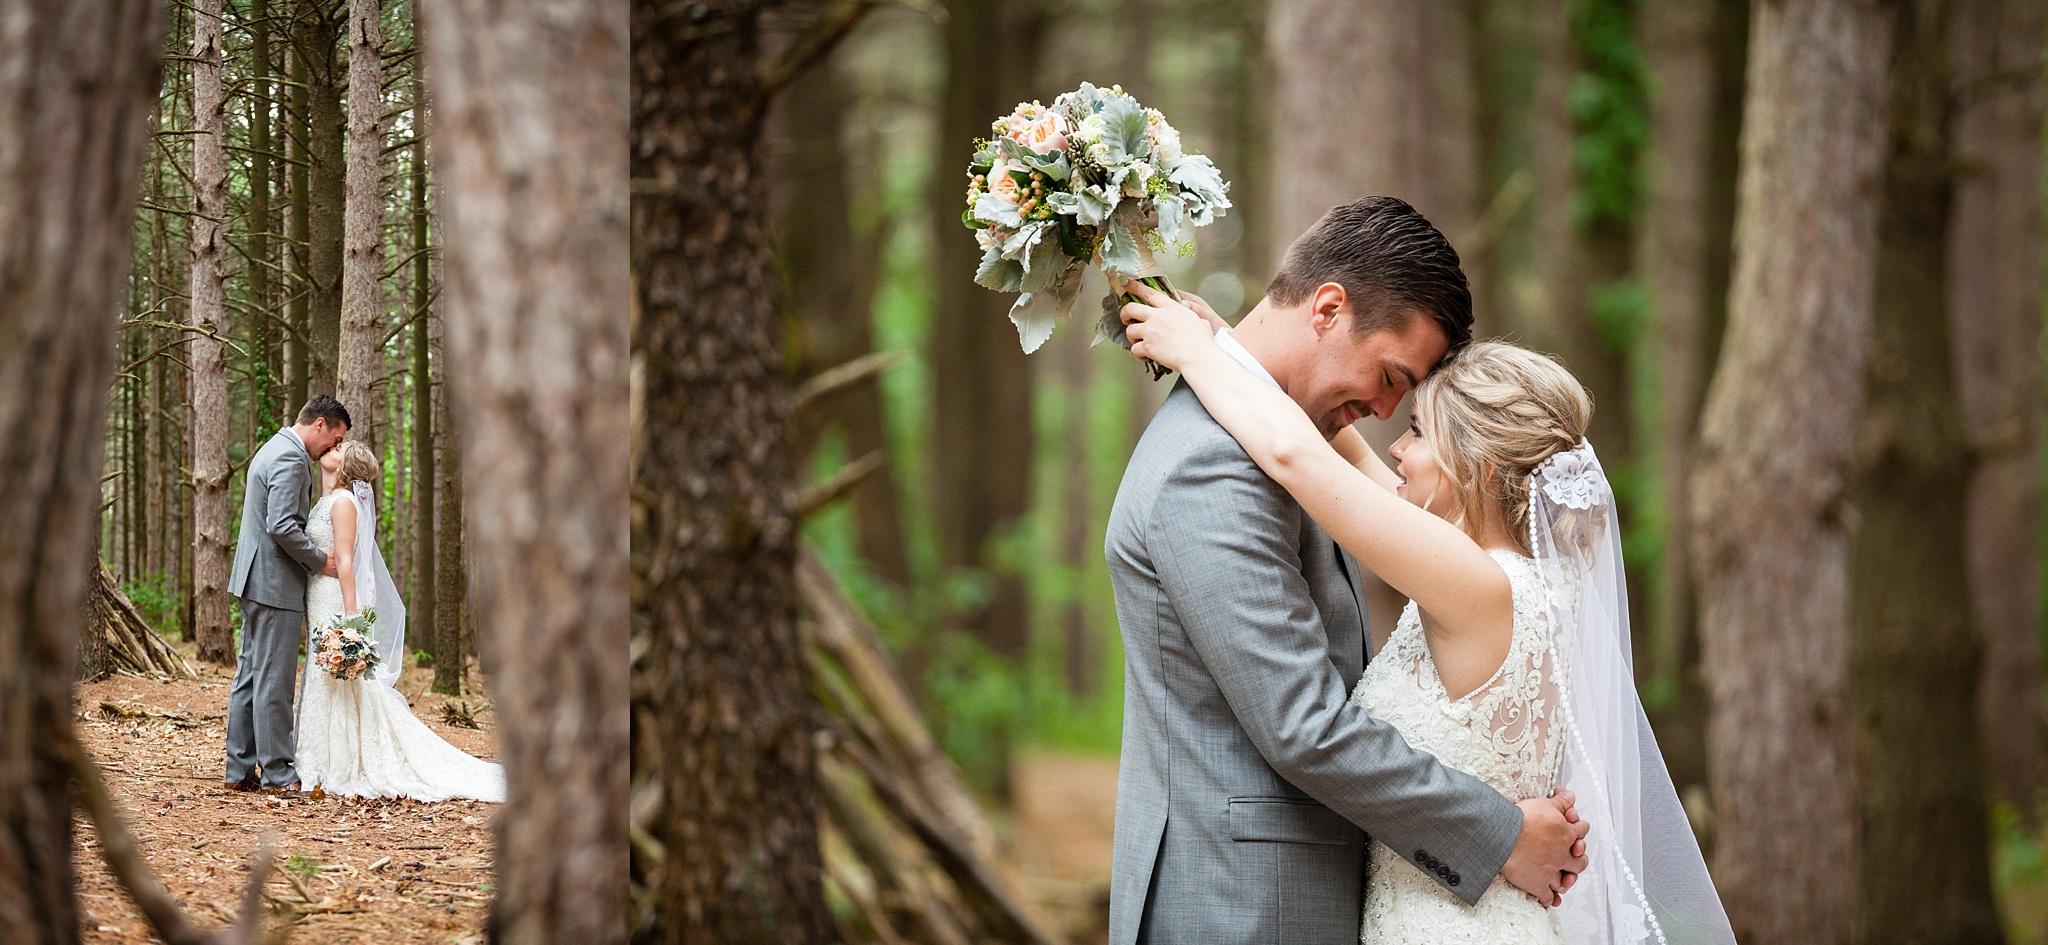 Mandi_Jack_Treehouse_Grand_Rapids_Wedding_0024.jpg